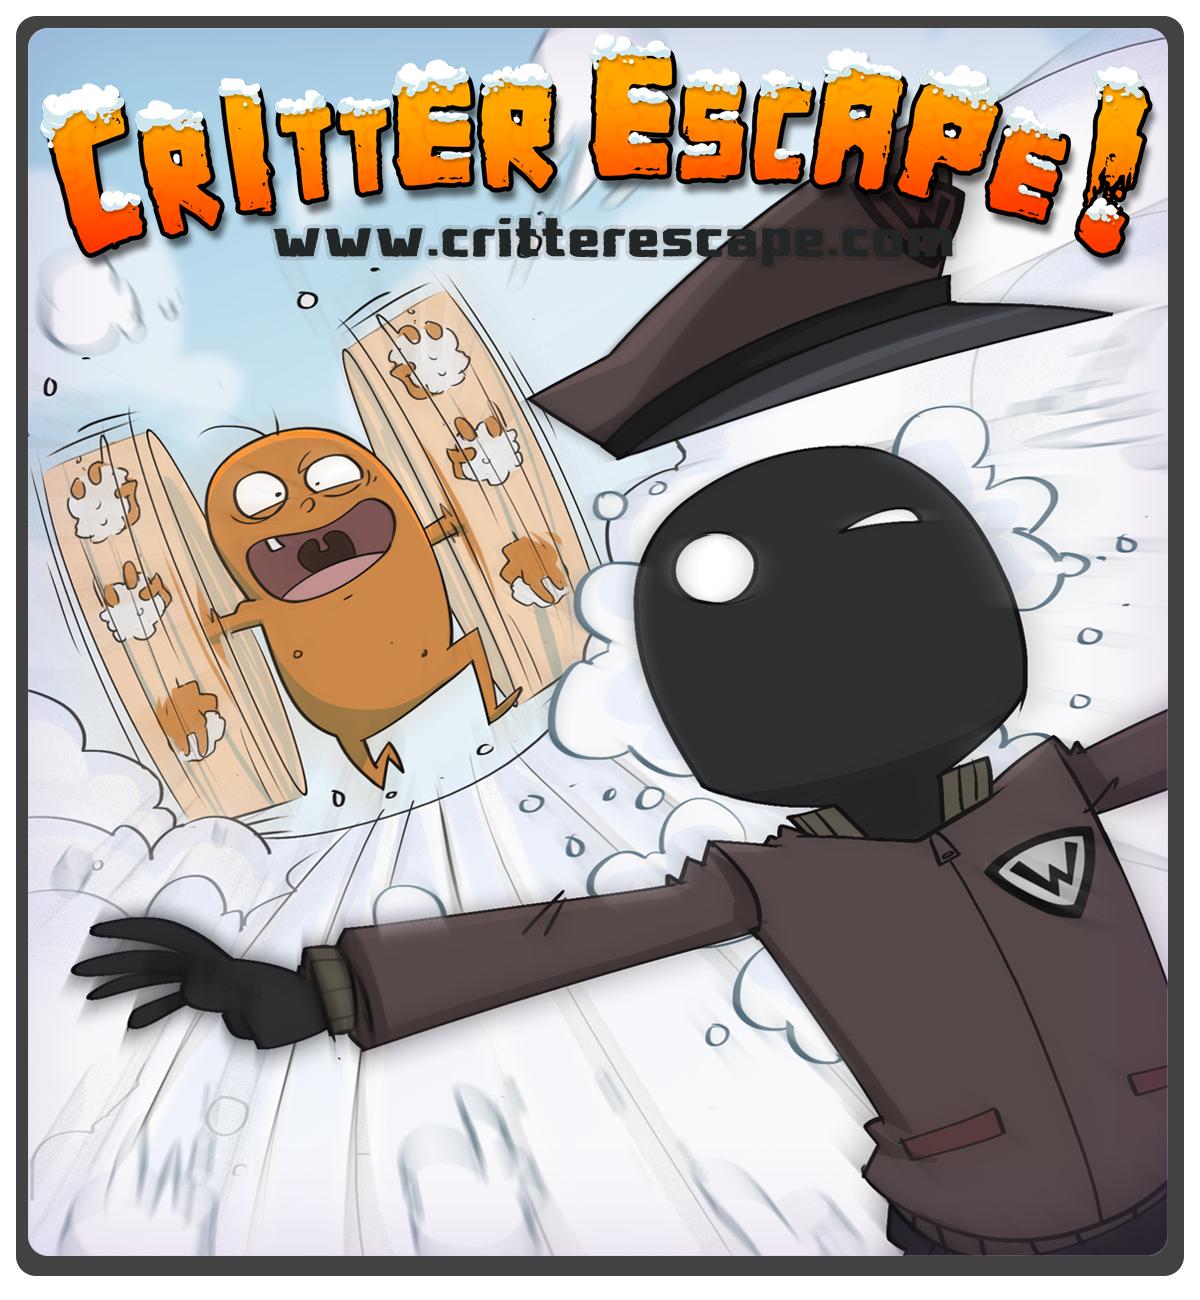 CritterEscape_Scene_Illustration_snowballfight.jpg